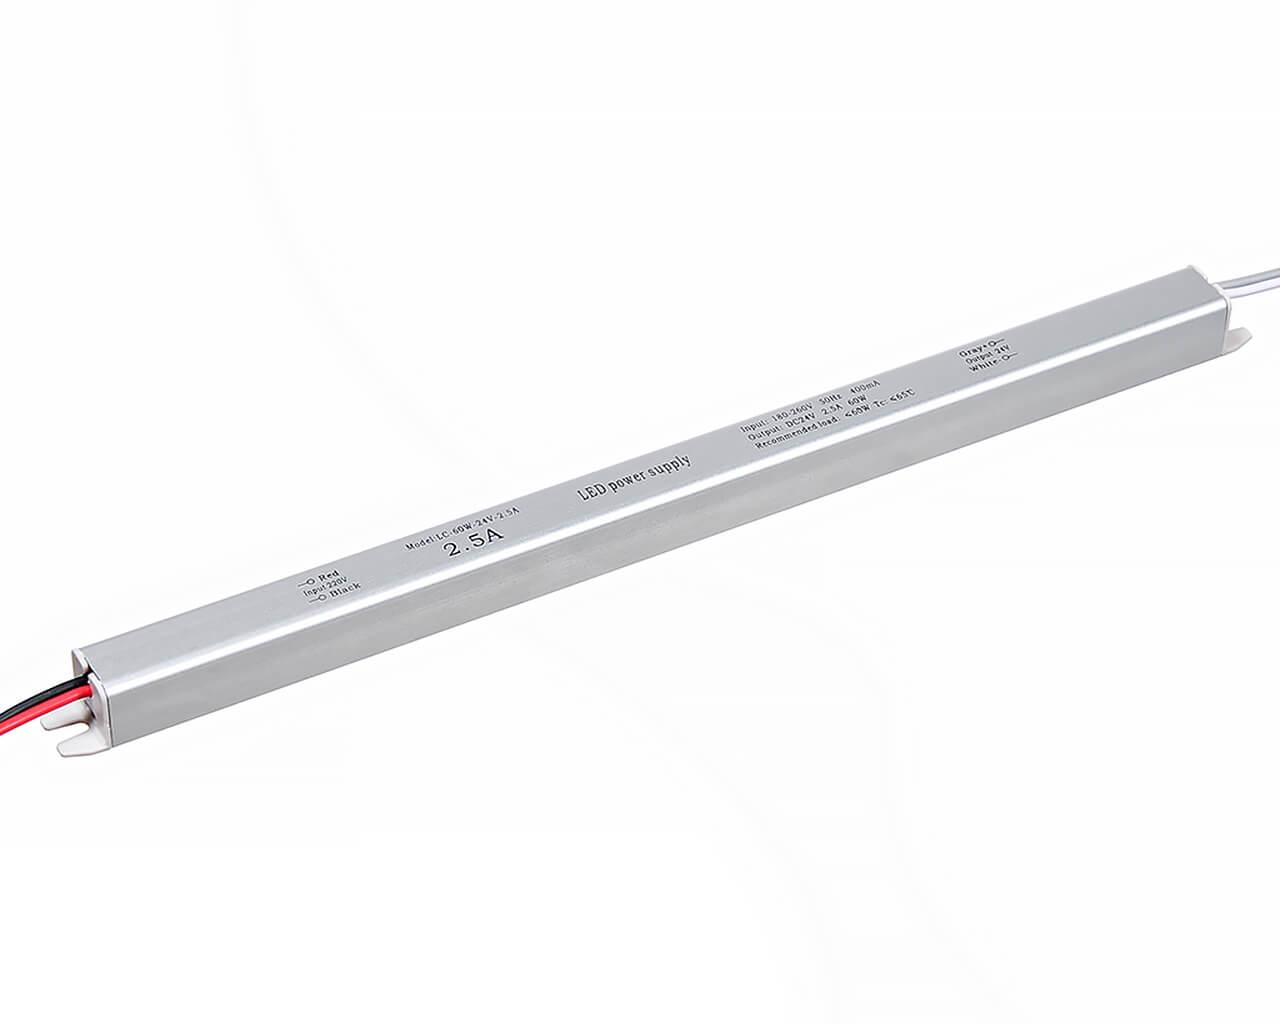 Блок питания LC-K60W-24V 2,5А (карандаш 312*18*18)